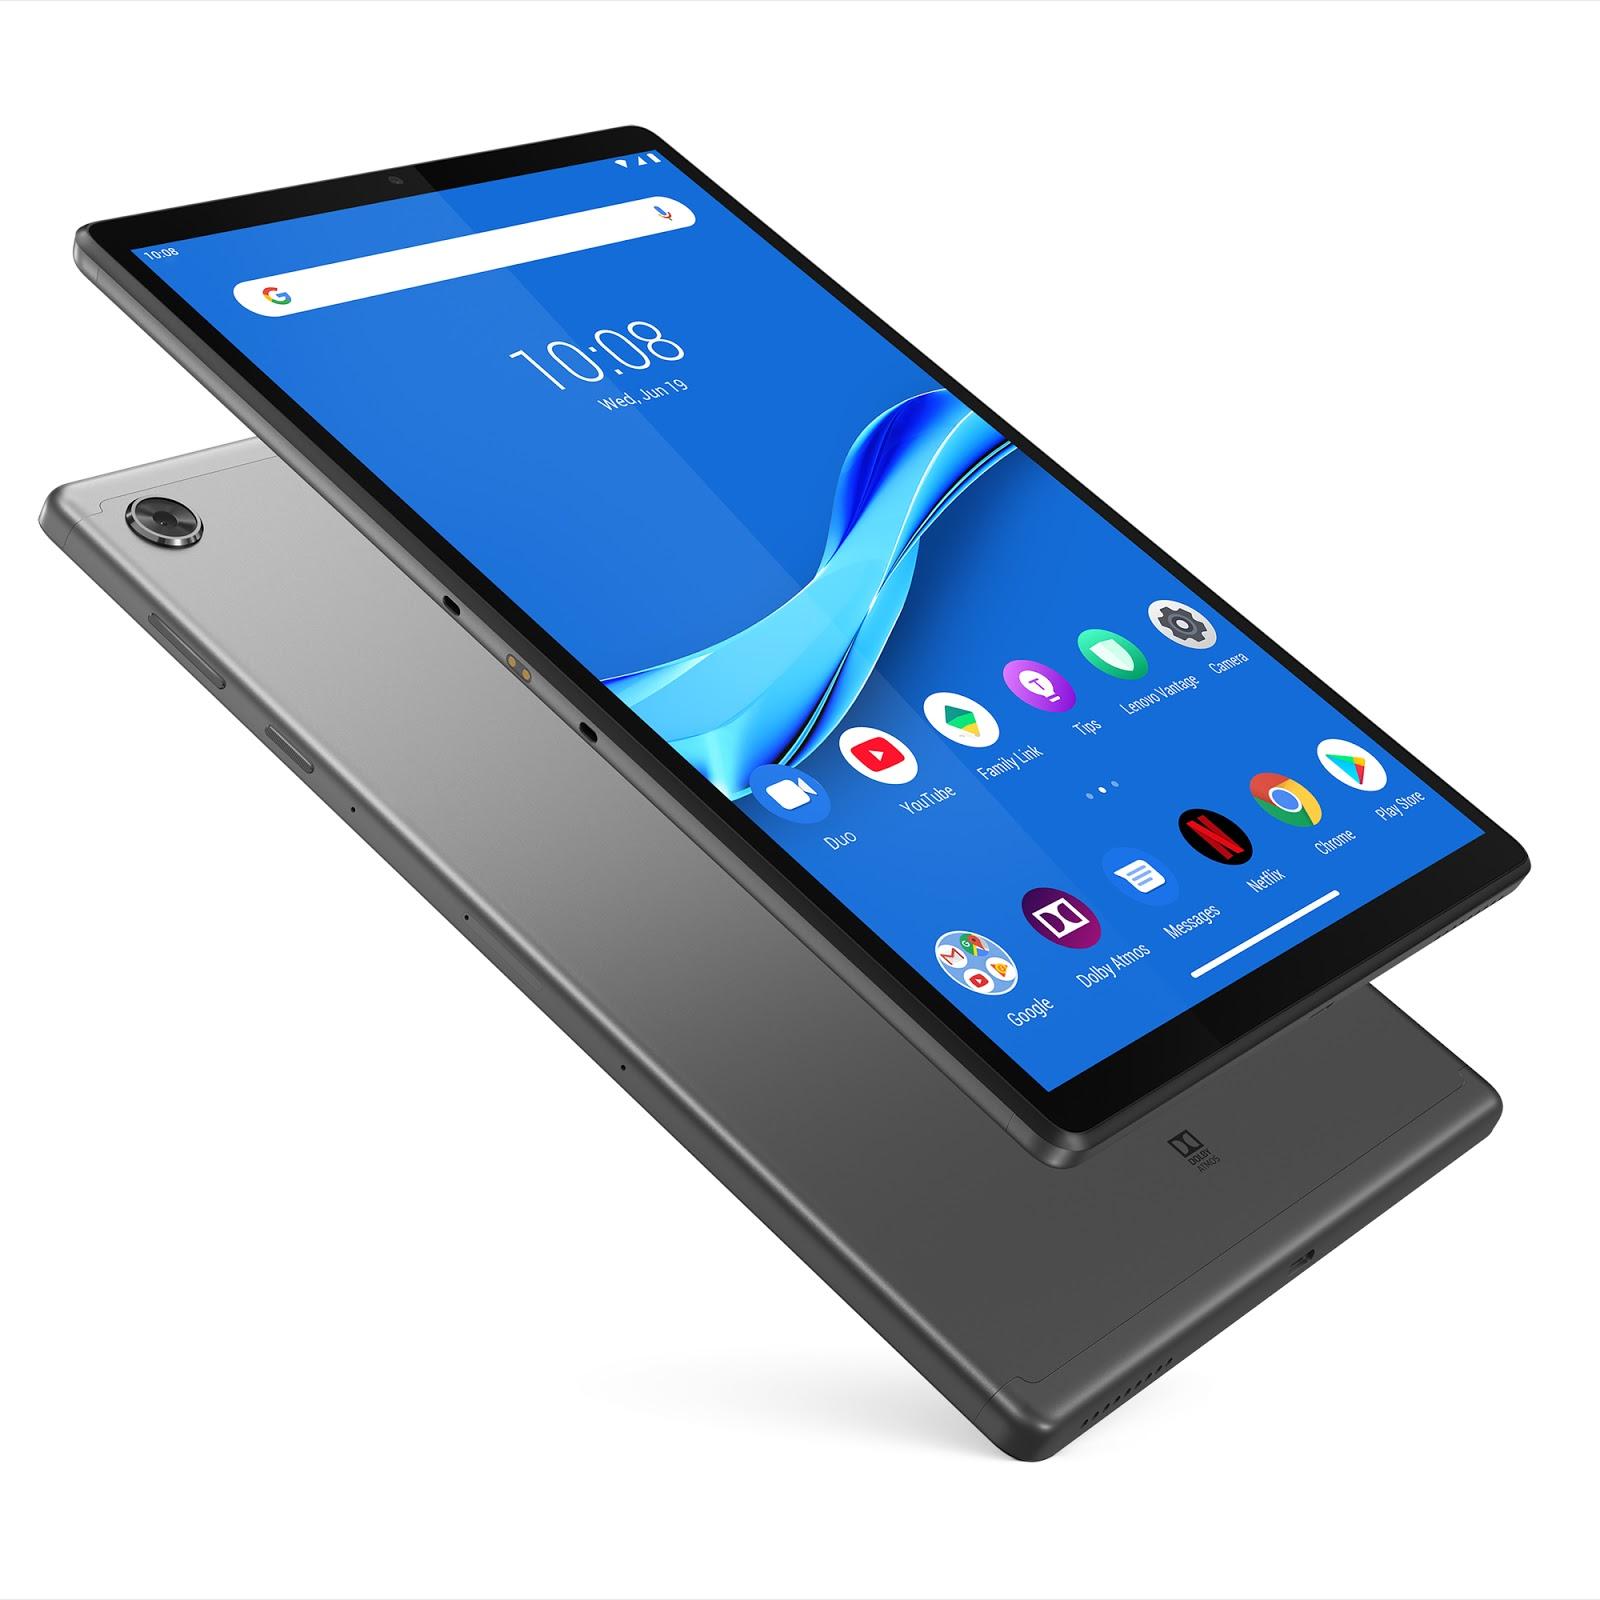 lenovo tab m10 specs, lenovo tablet philippines, buy lenovo tablet online philippines, tablet for sale philippines